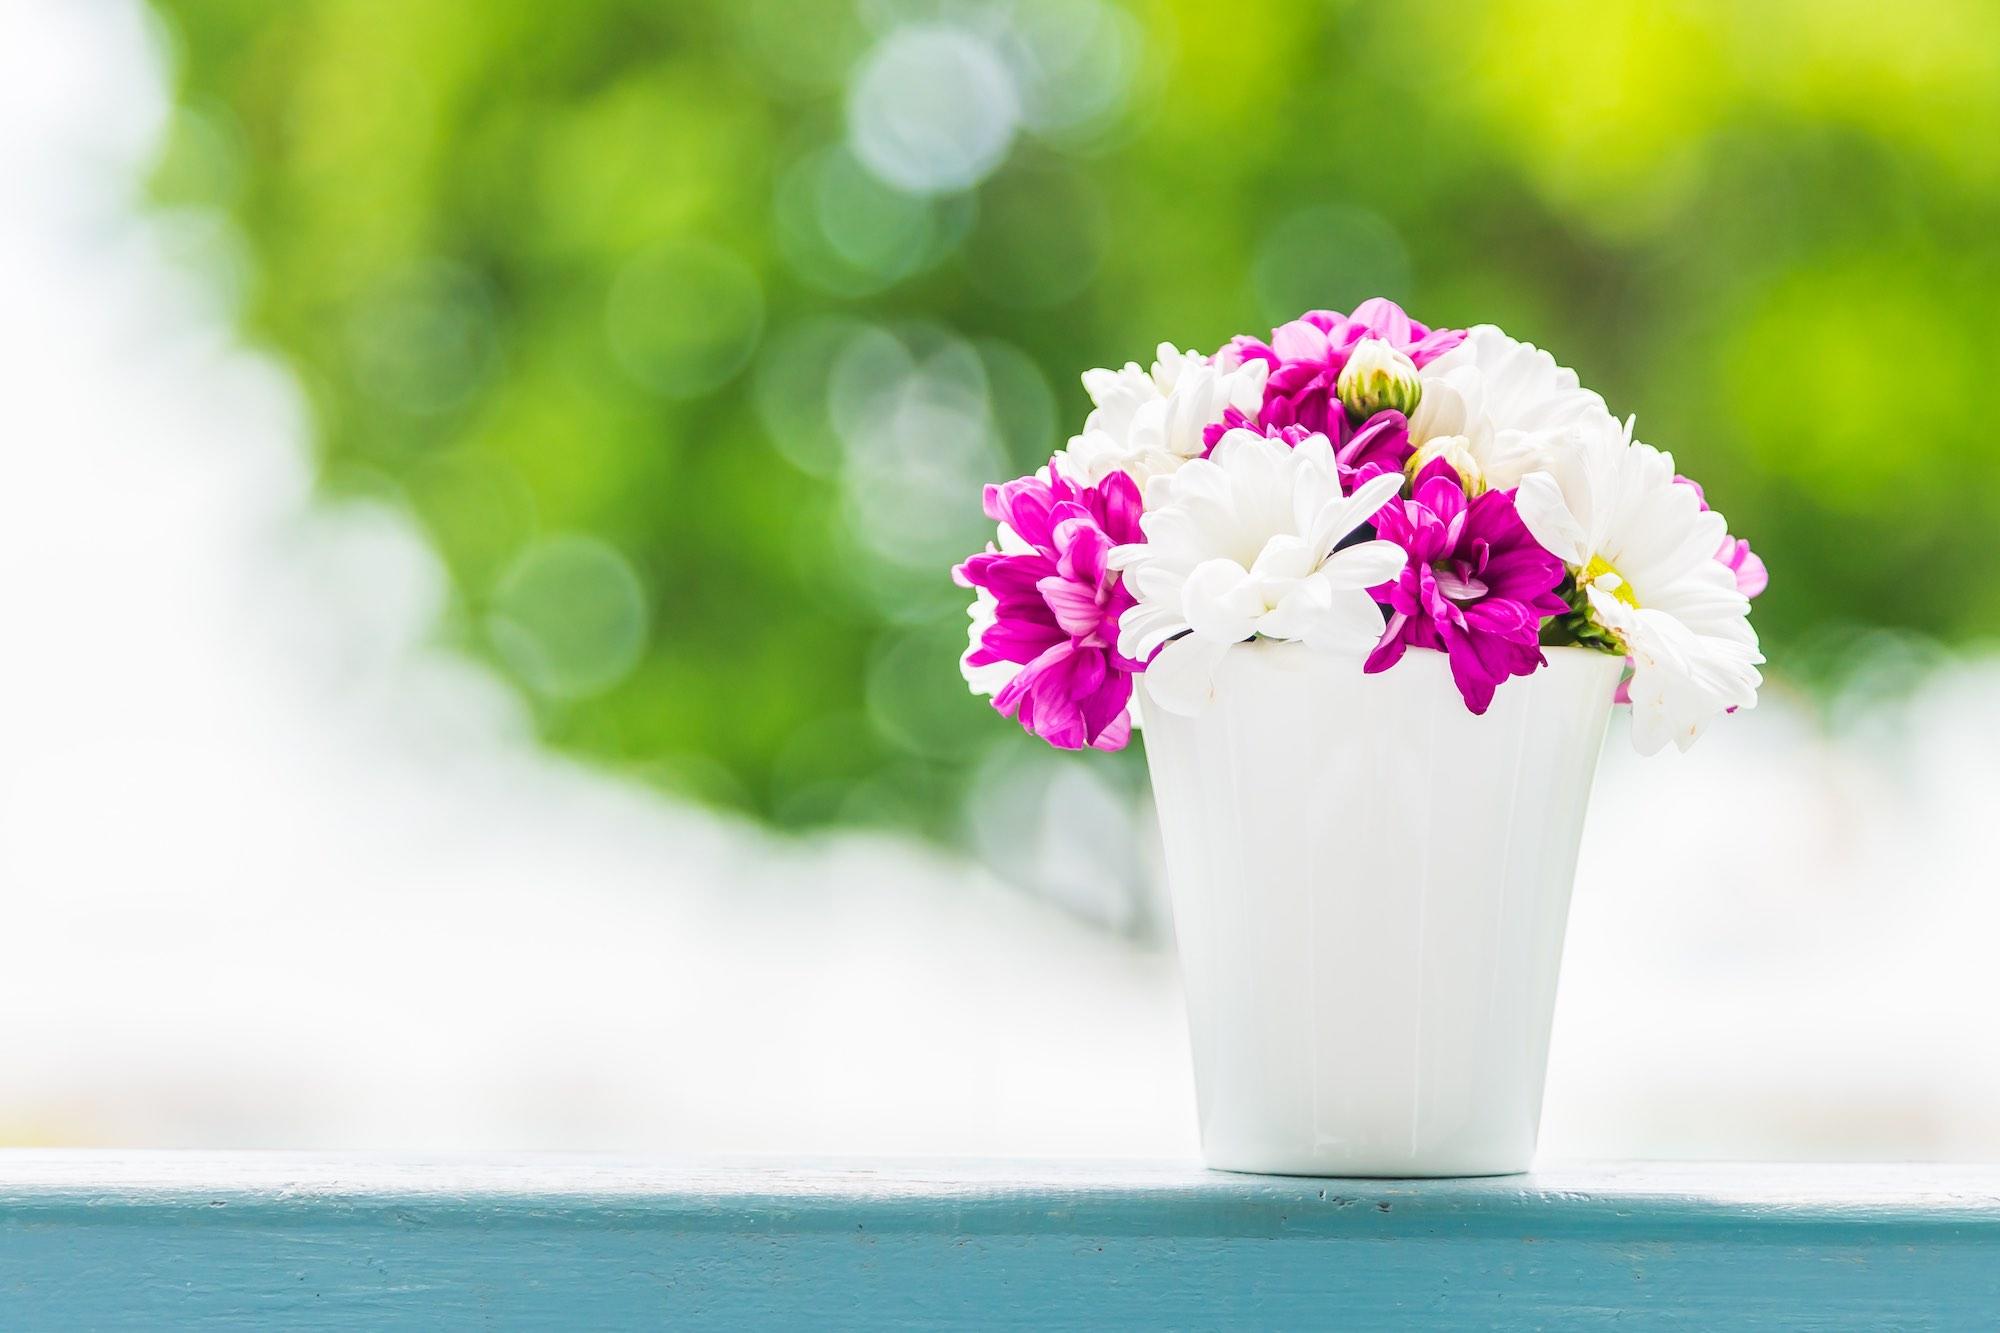 Boquet of flower in vase